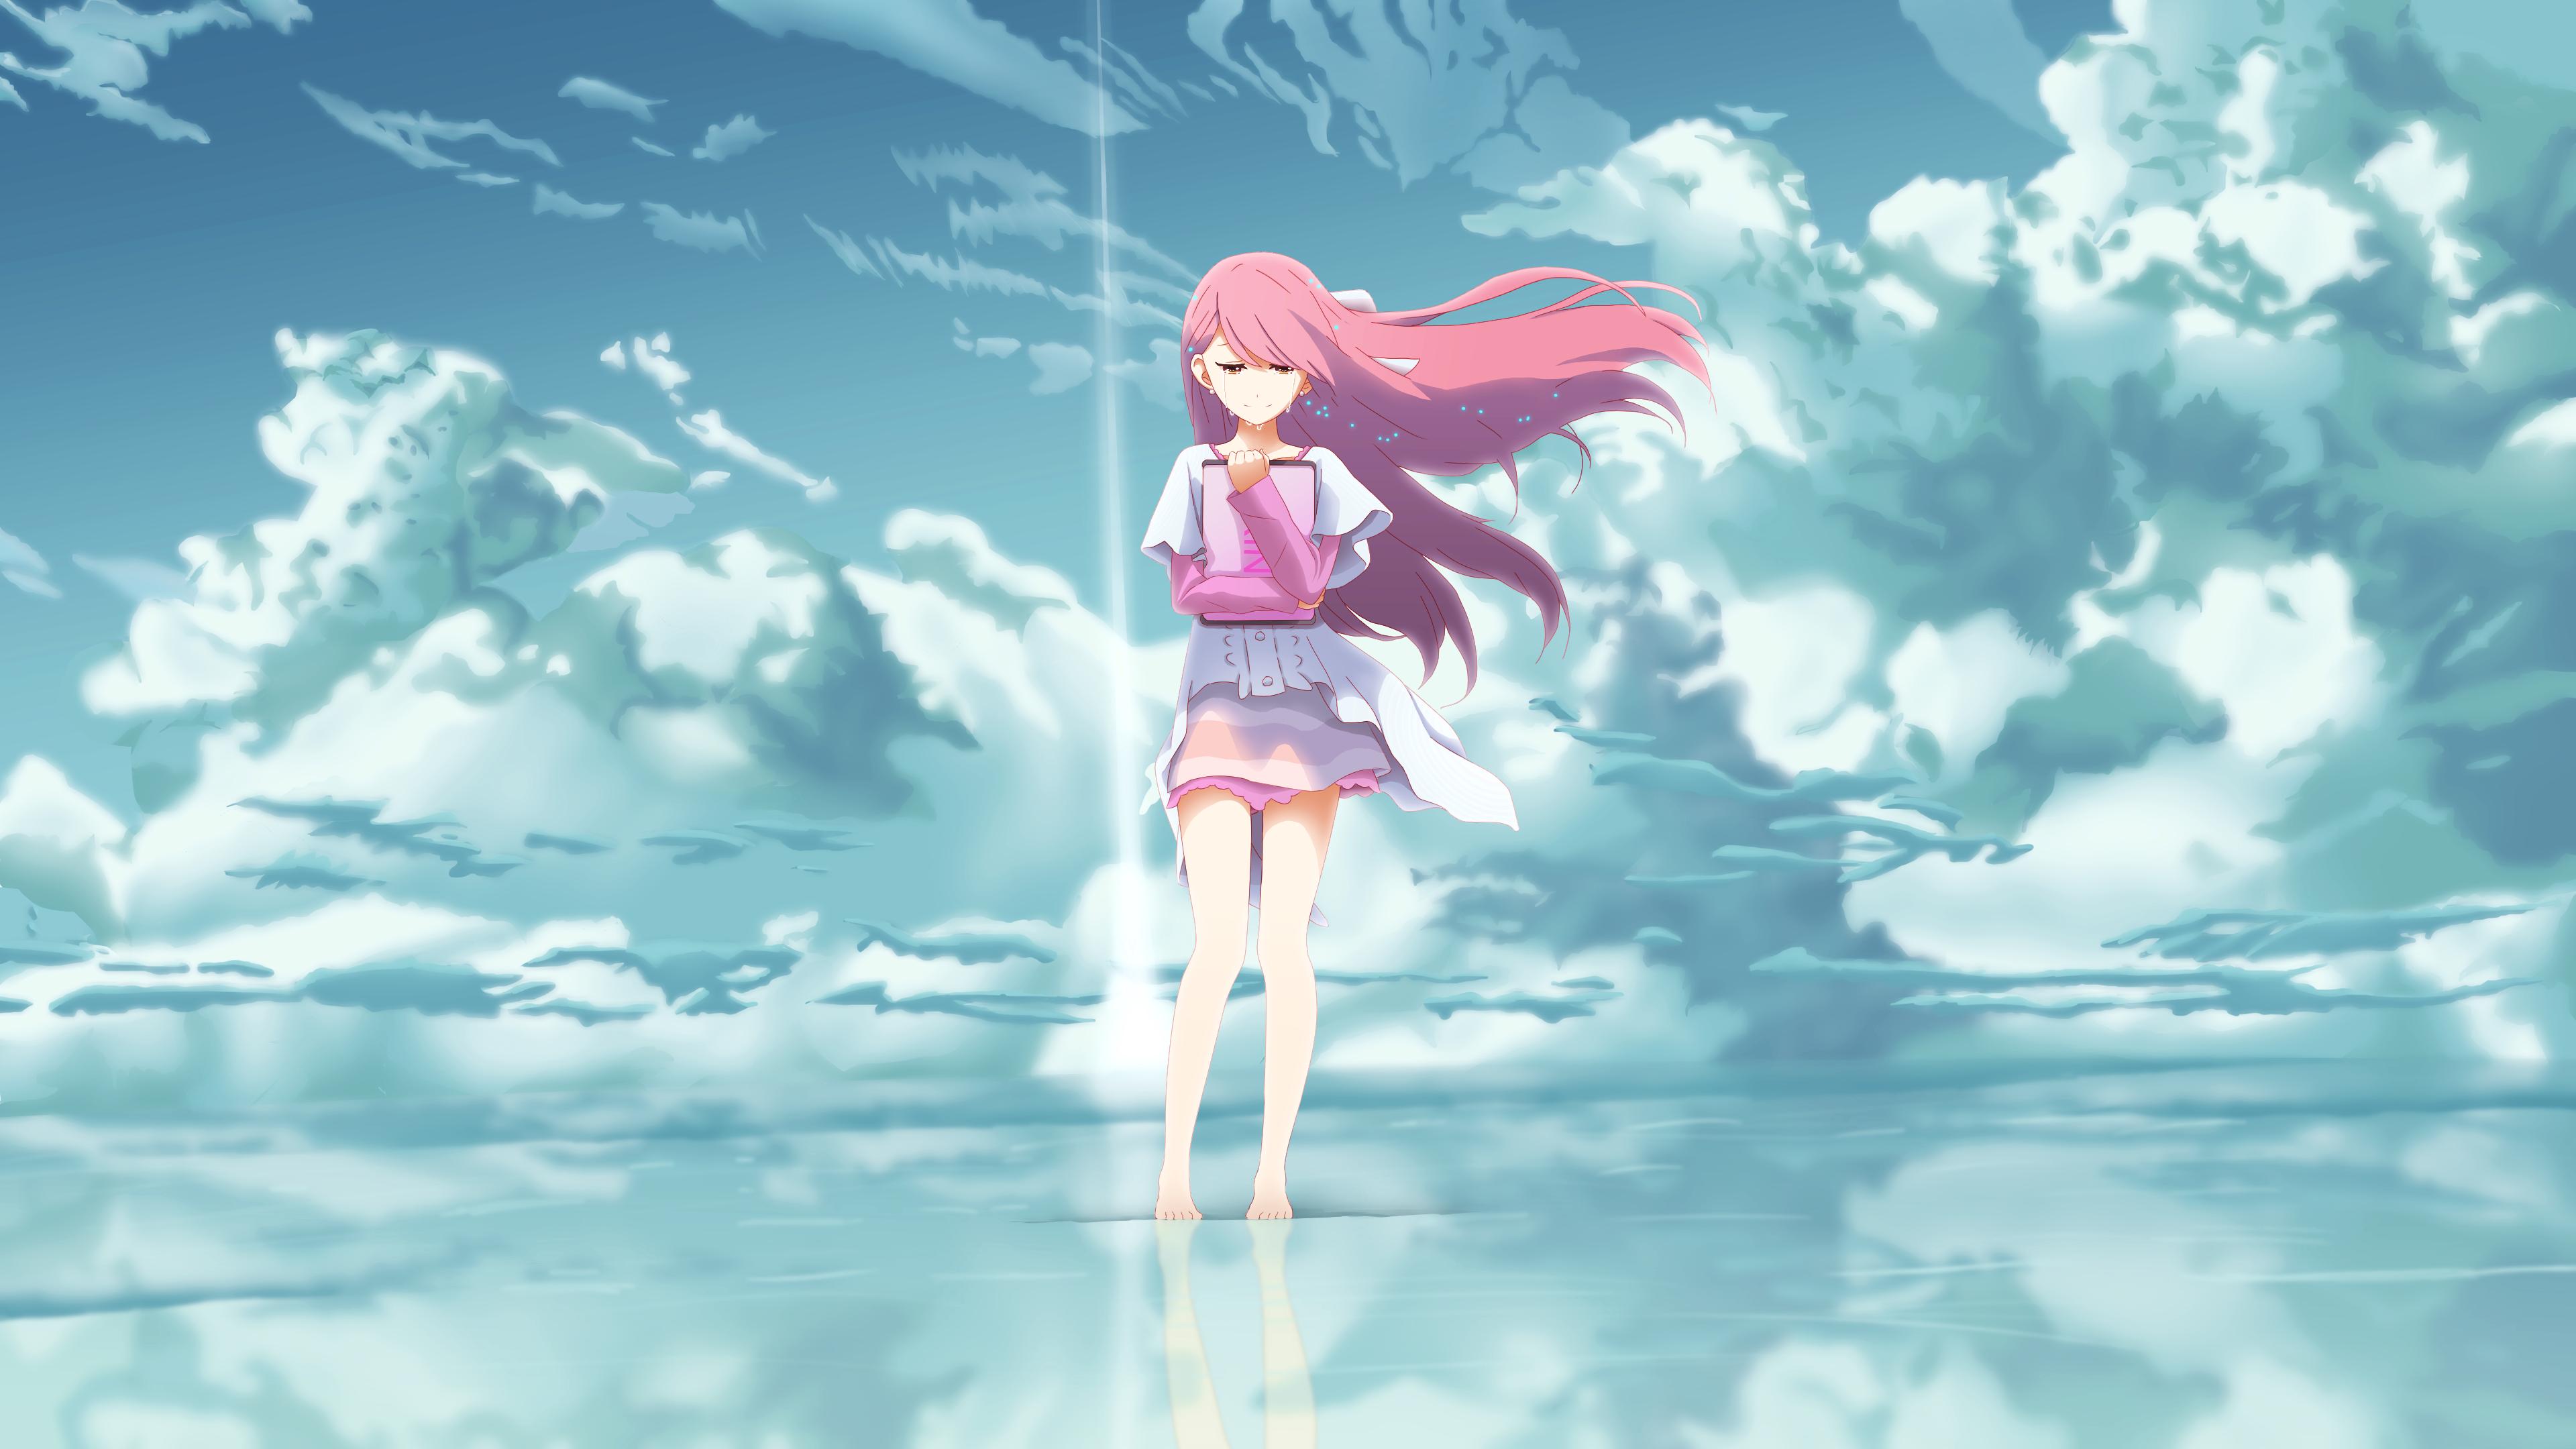 Anime Desktop Backgrounds 3840x2160 Download Hd Wallpaper Wallpapertip